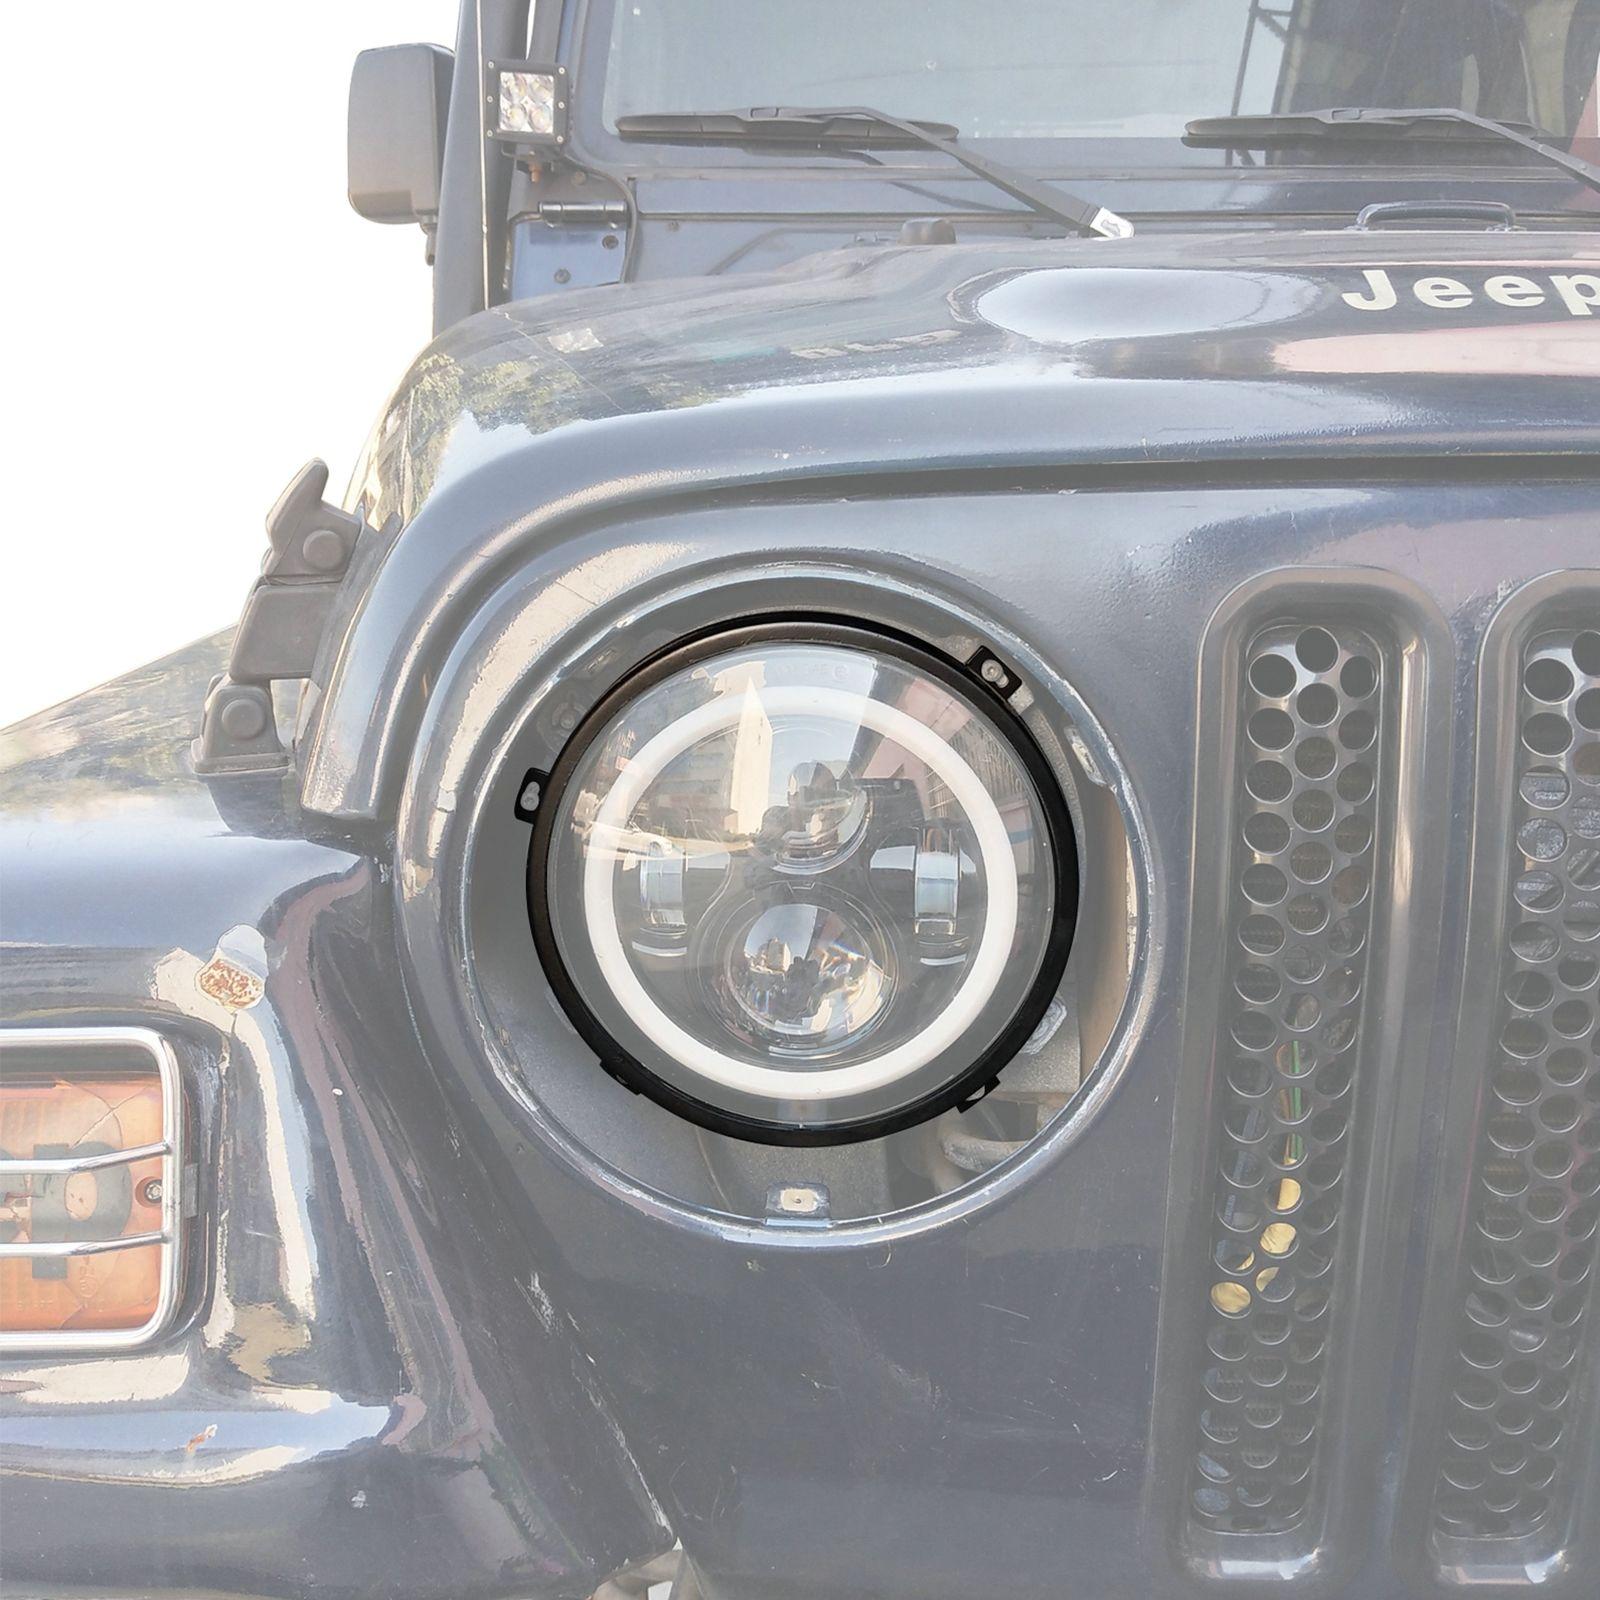 One New Chrome Headlight Retaining Ring 1997 to 2006 Jeep Wrangler Tj X 12420.02